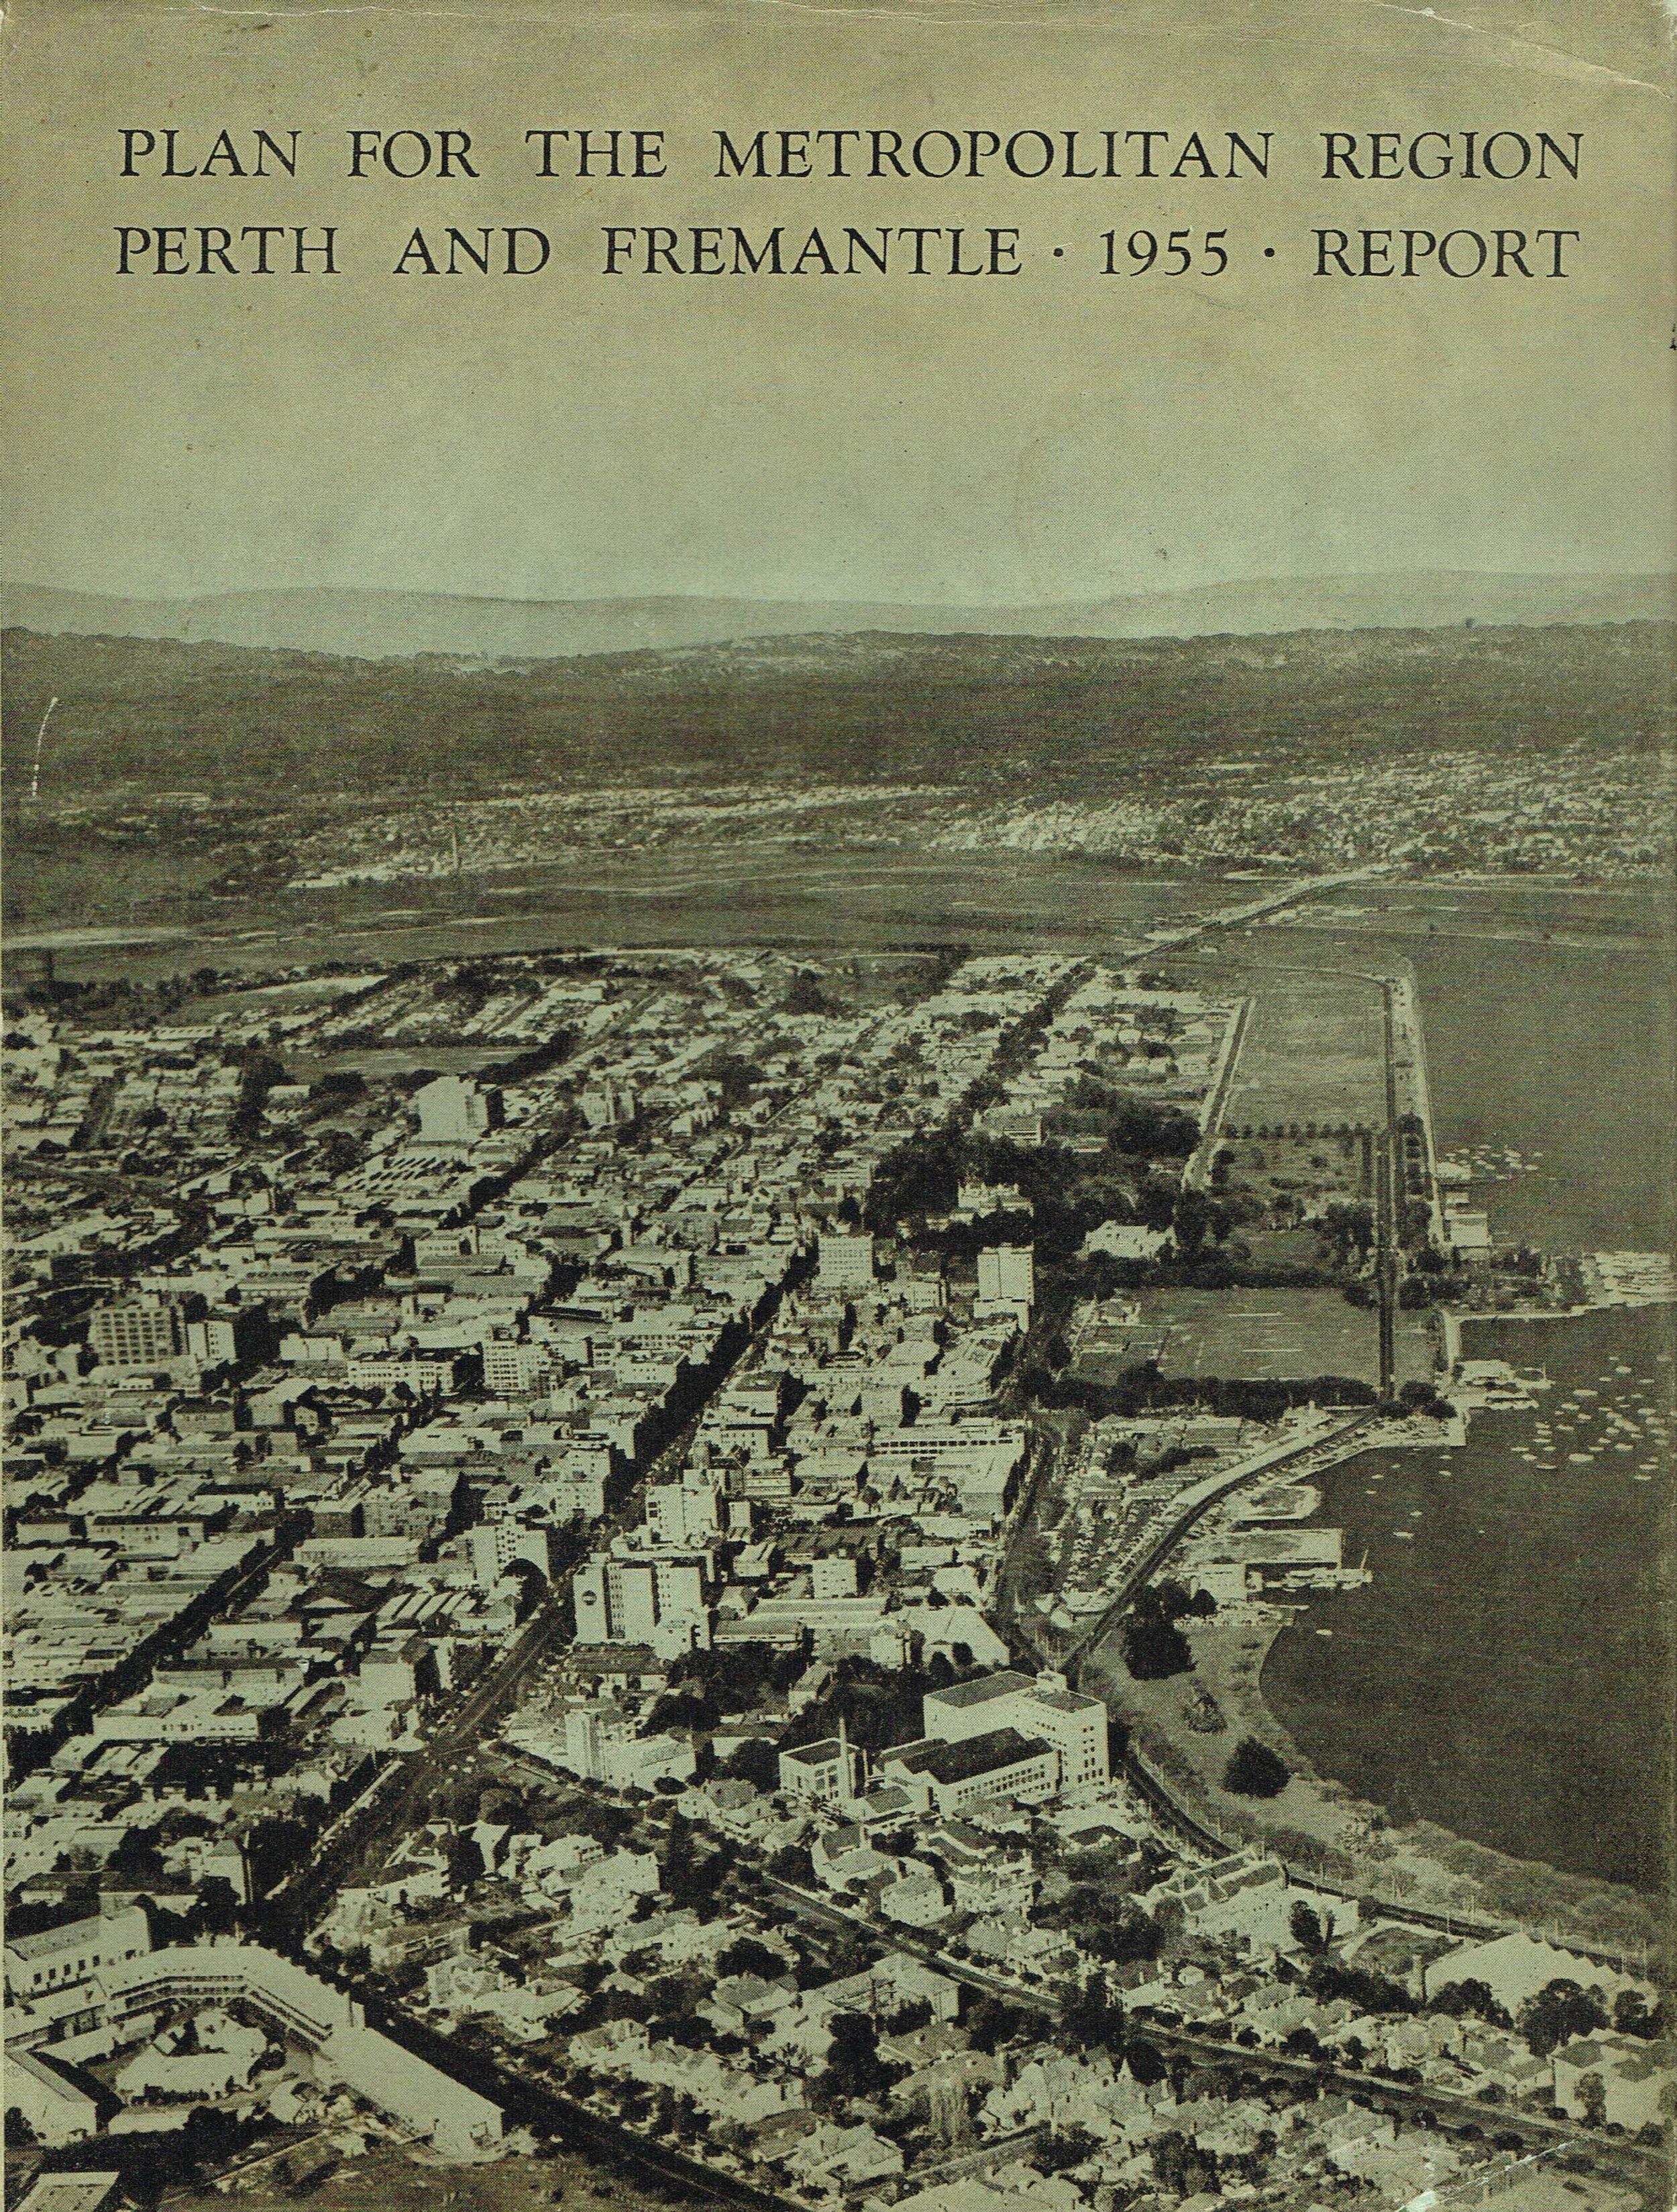 Plan for the Metropolitan Region Perth and Fremantle 1955 Report  Gordon Stephenson and J.A. Hepburn